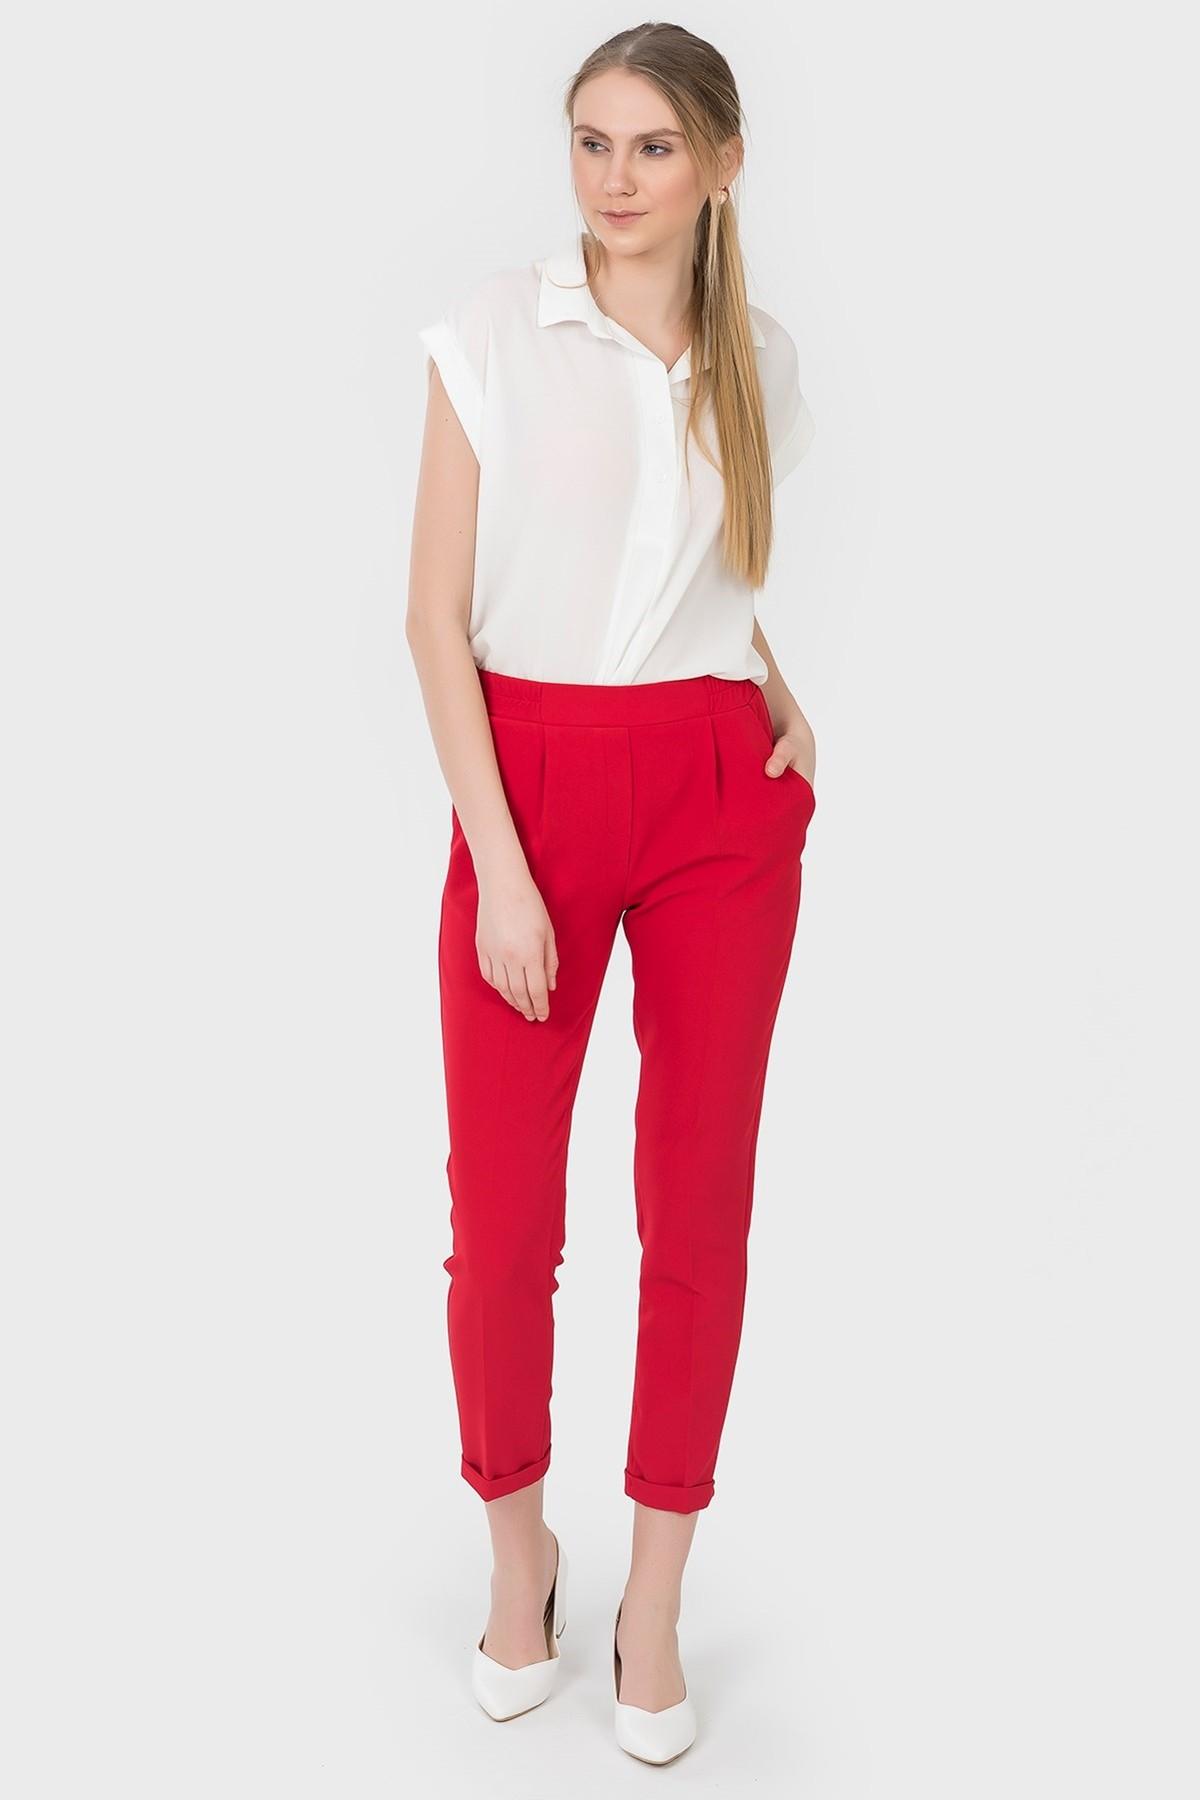 İroni Kadın Kırmızı Jogger Pantolon 1671-891 1